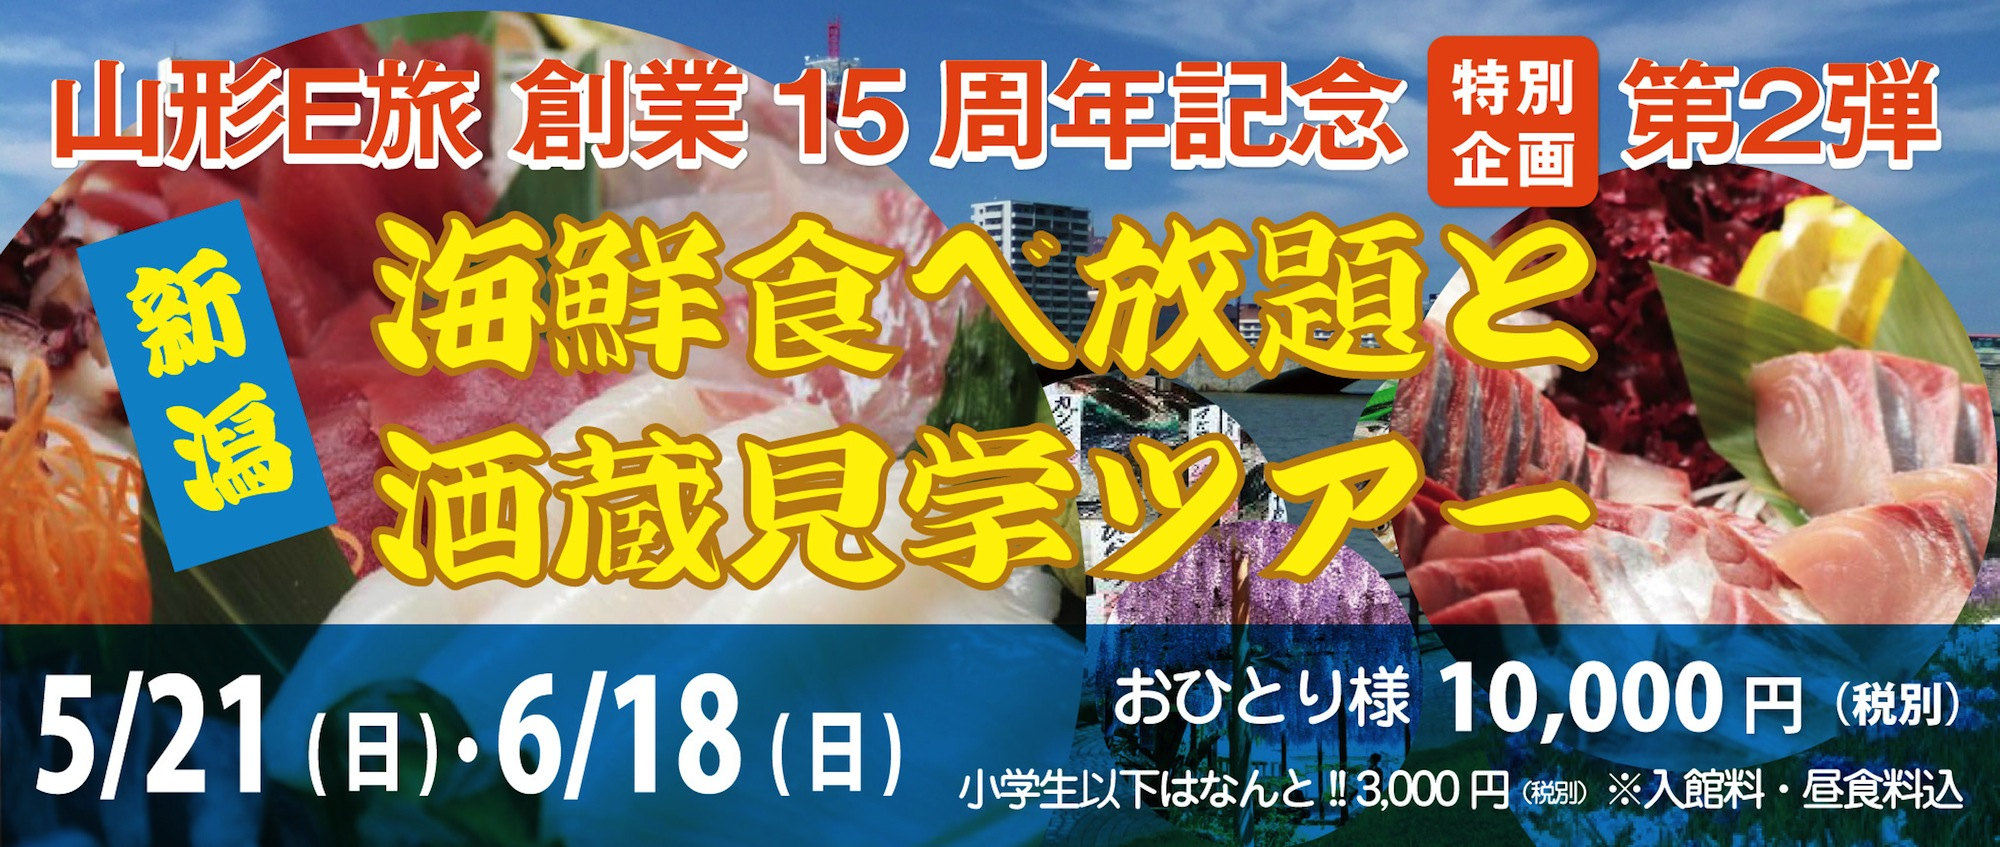 E旅創業15周年記念!特別企画第2弾!新潟の海鮮食べ放題と酒蔵見学ツアー 5月21日(日)・6月18日(日)